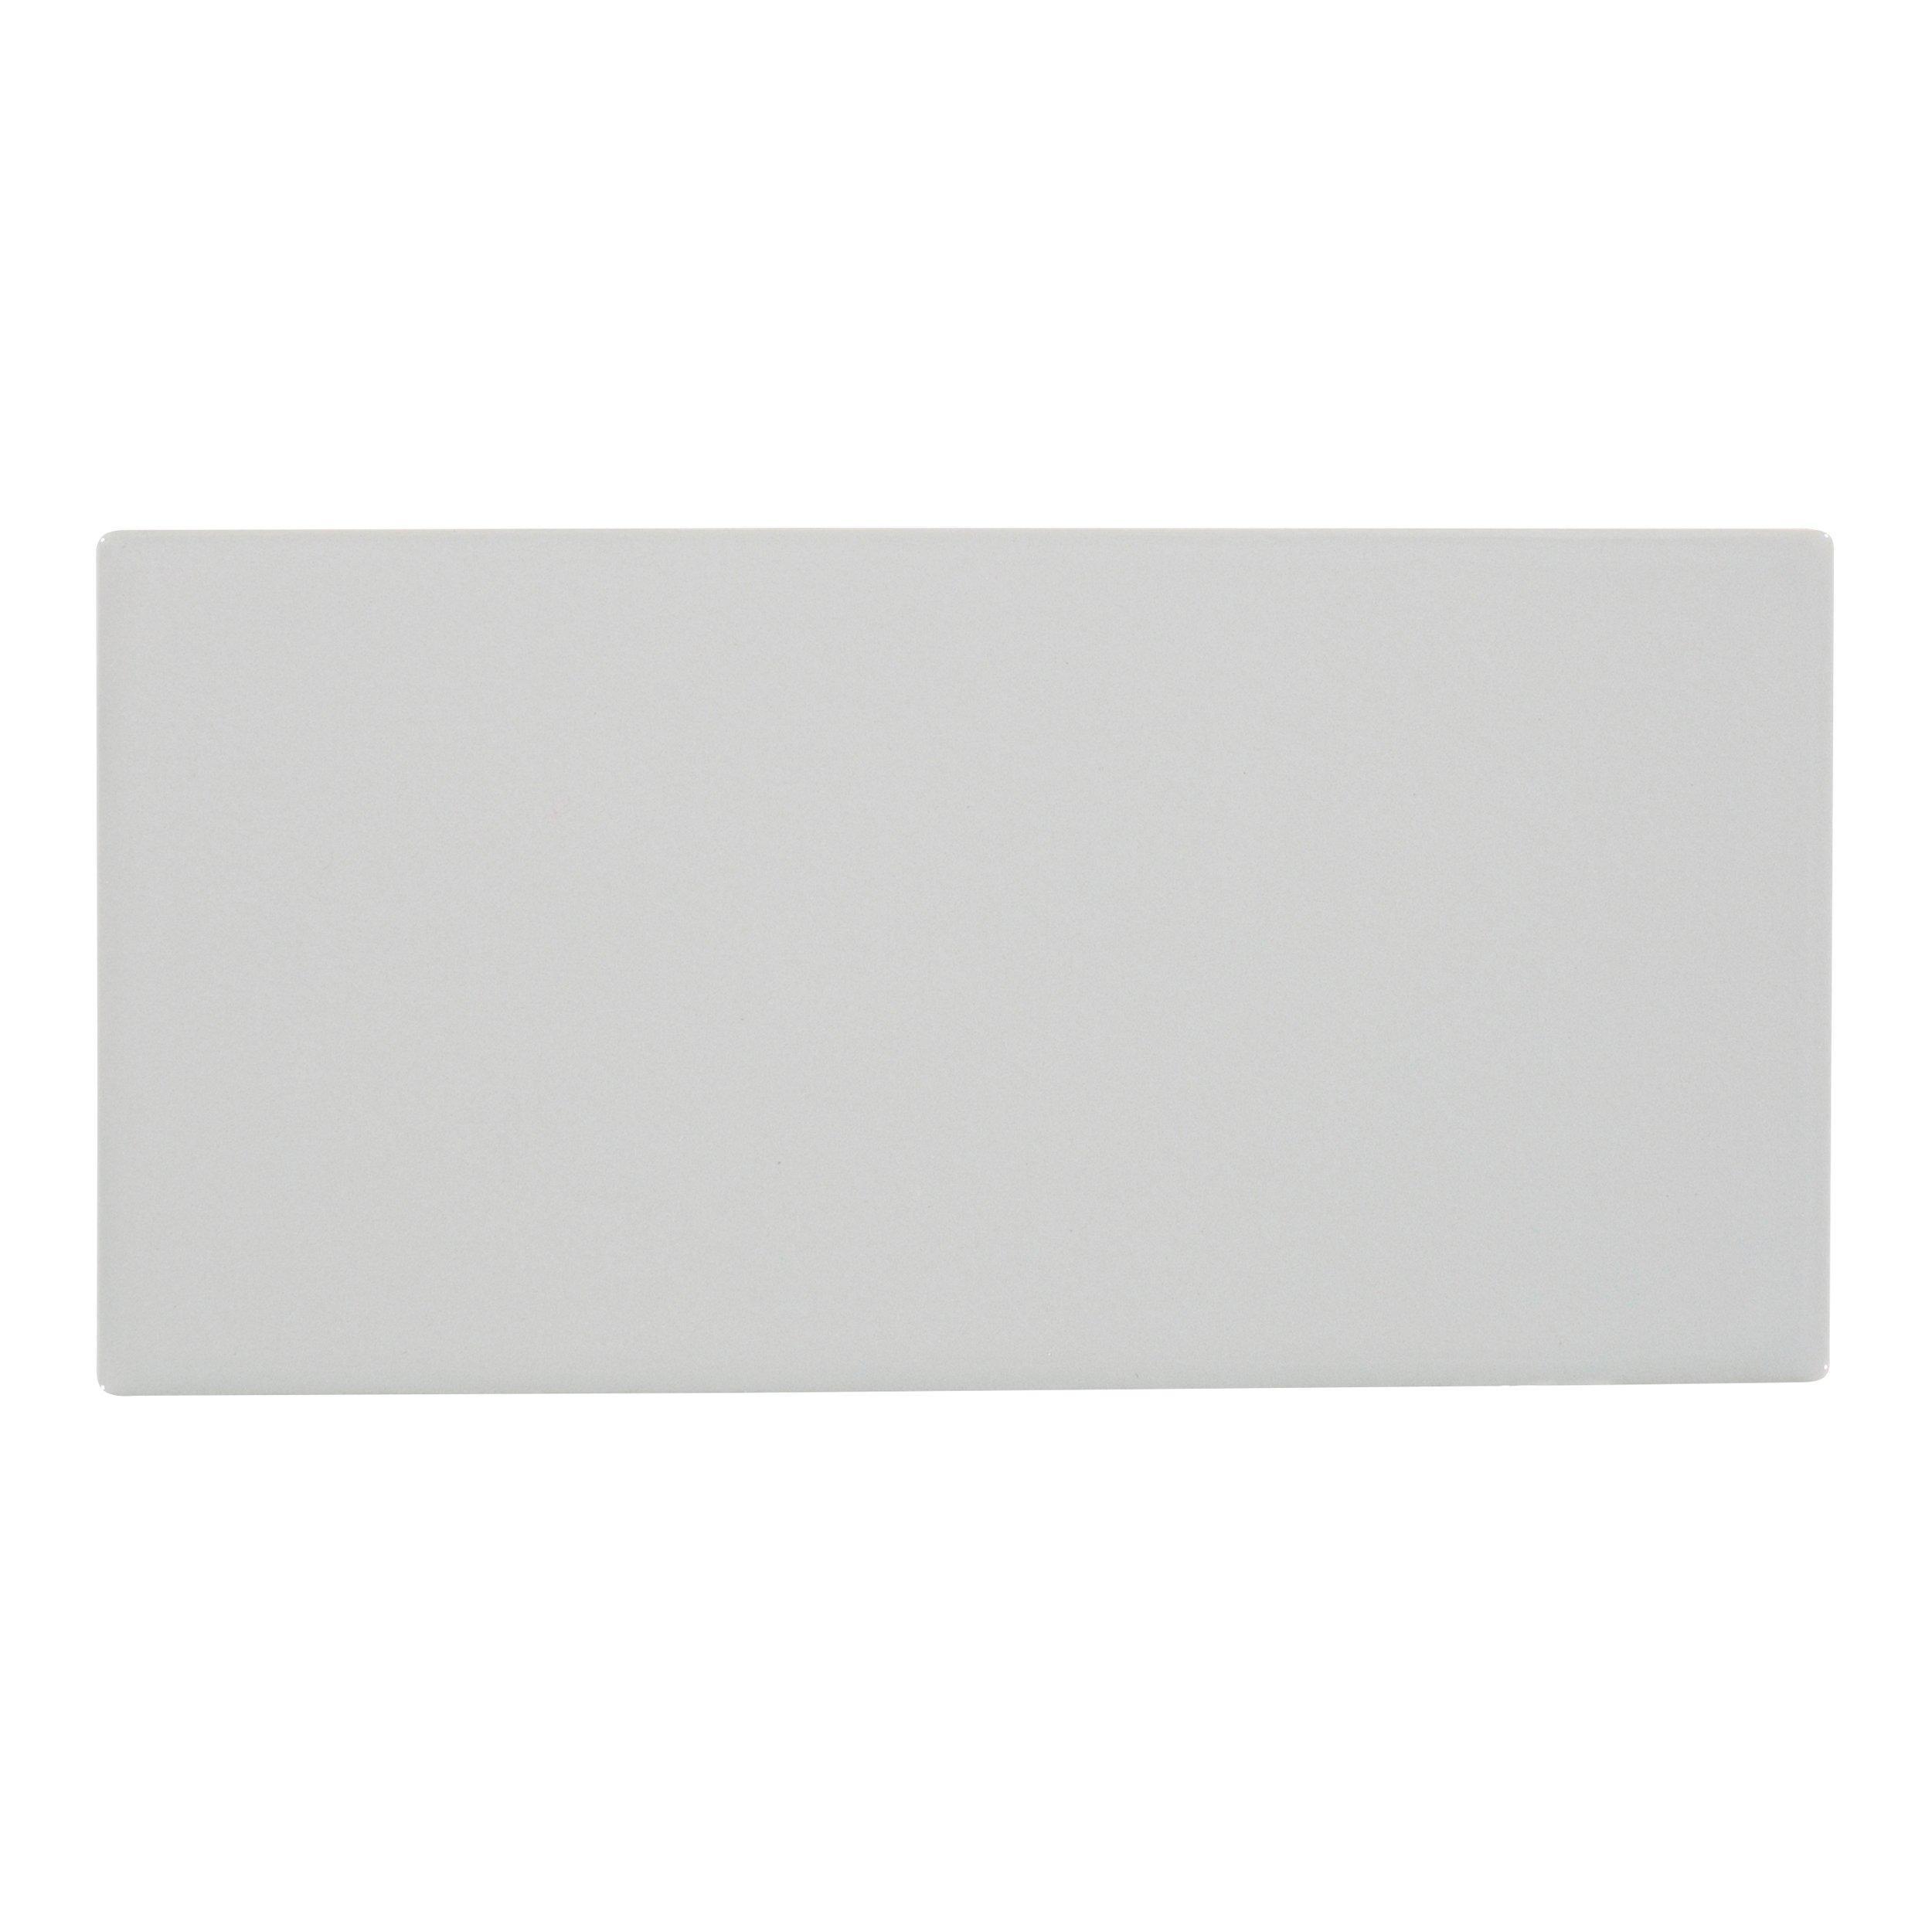 Bright Tender Gray Subway Ceramic Tile Wall Tiles